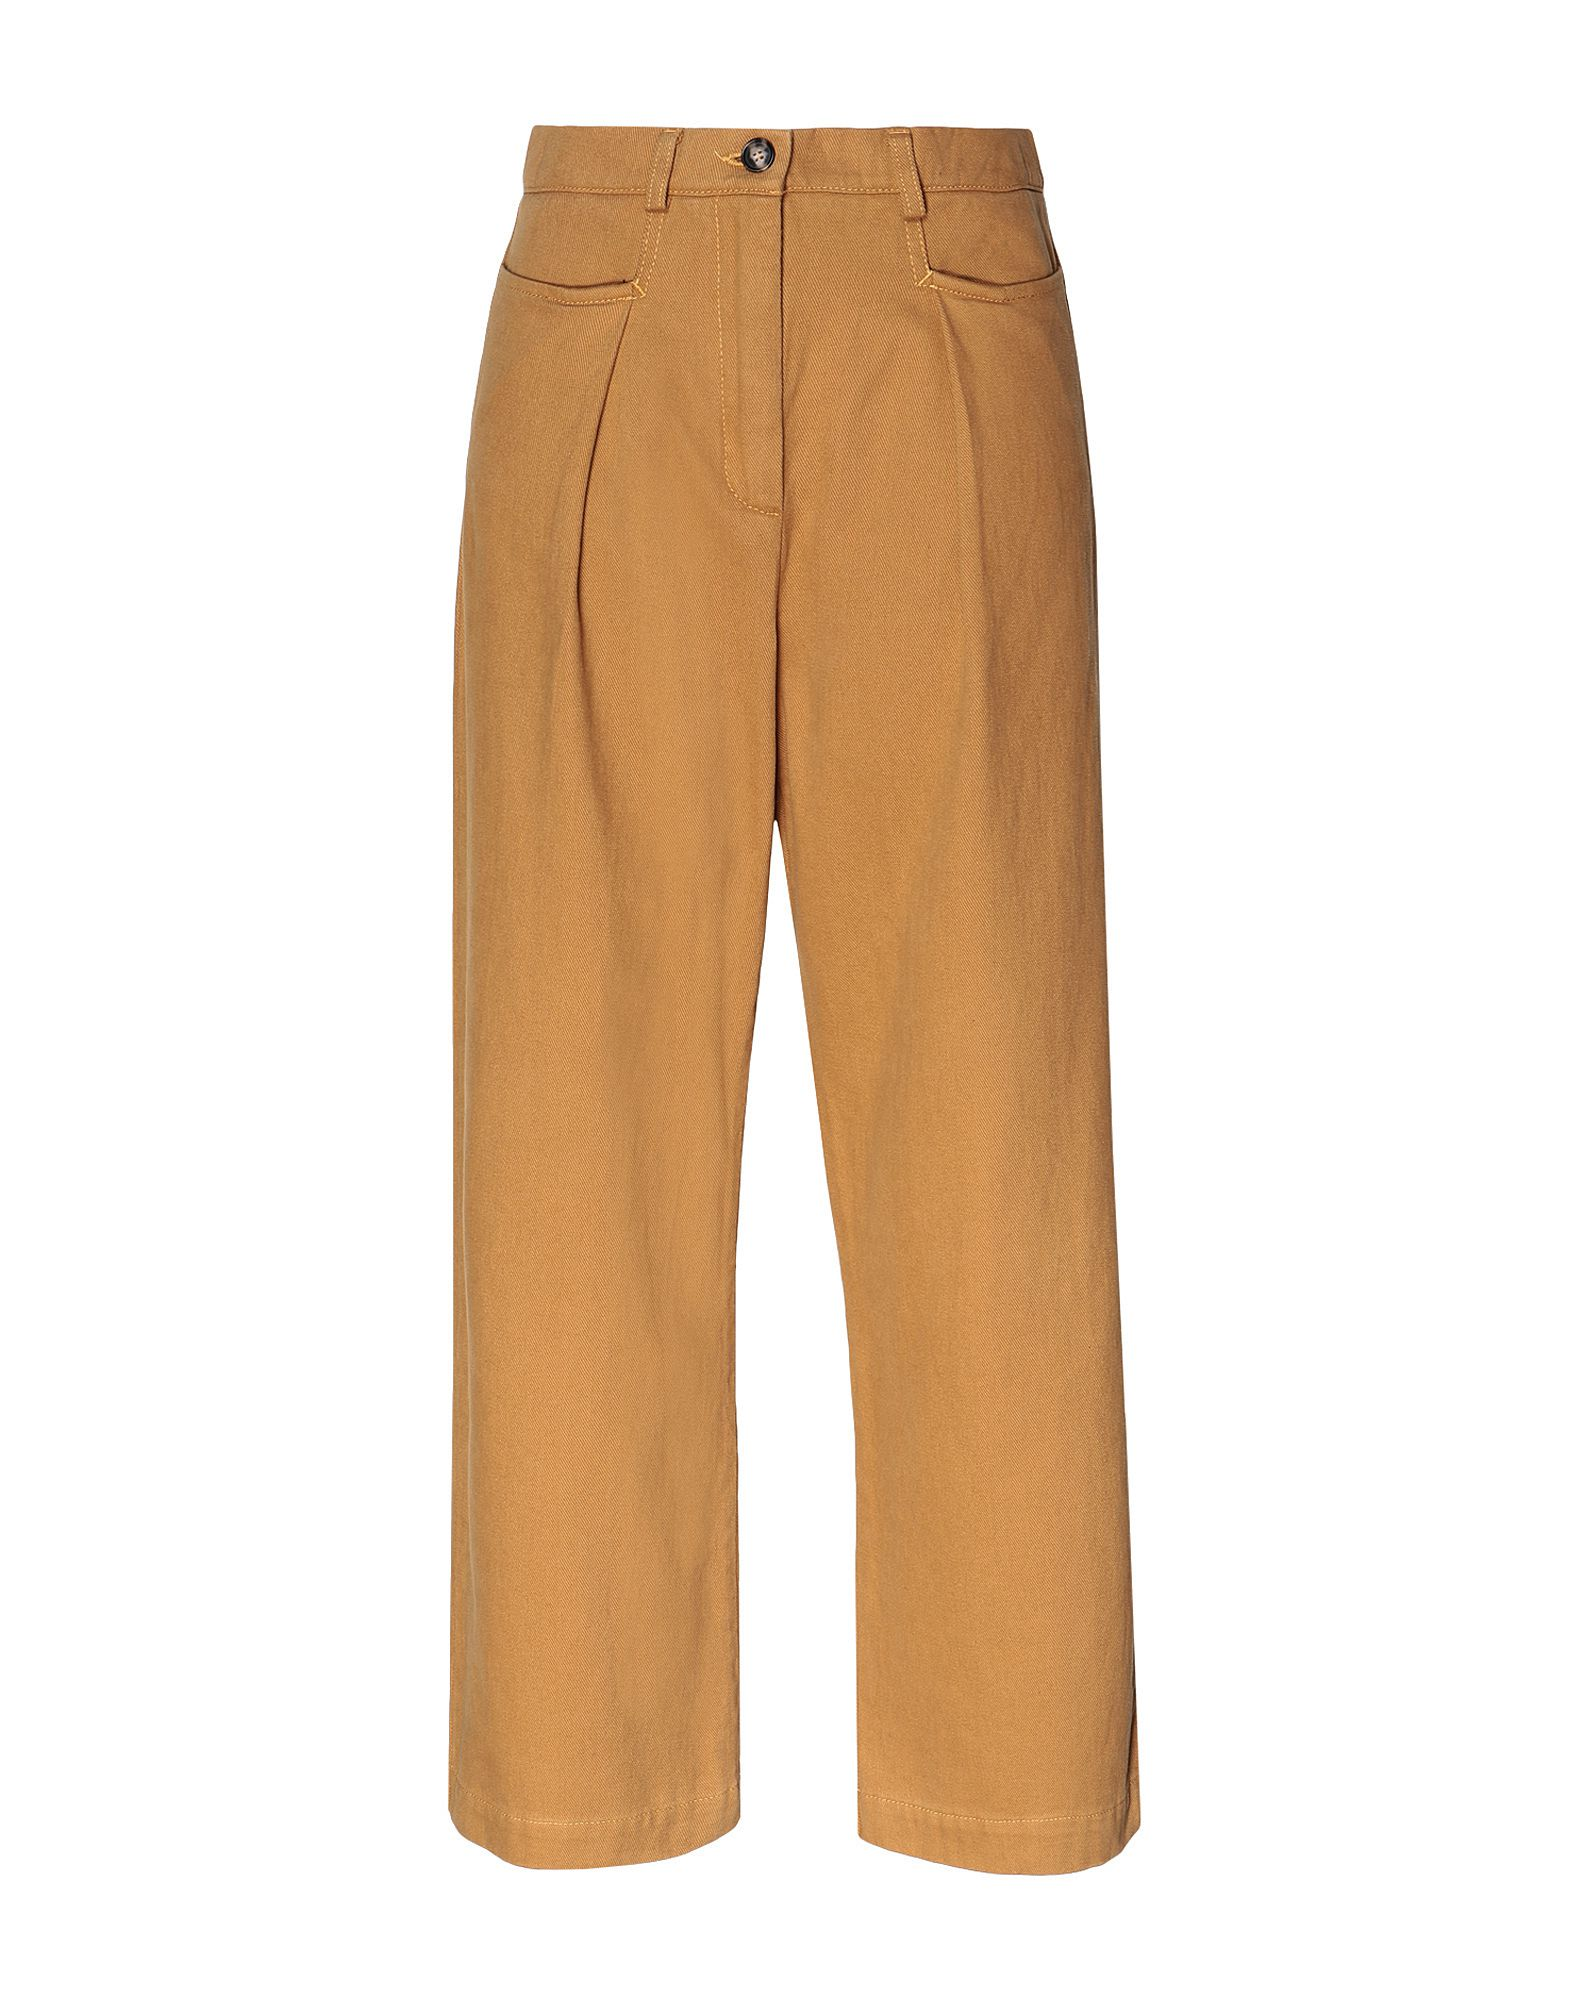 8 by YOOX Повседневные брюки брюки movies брюки палаццо